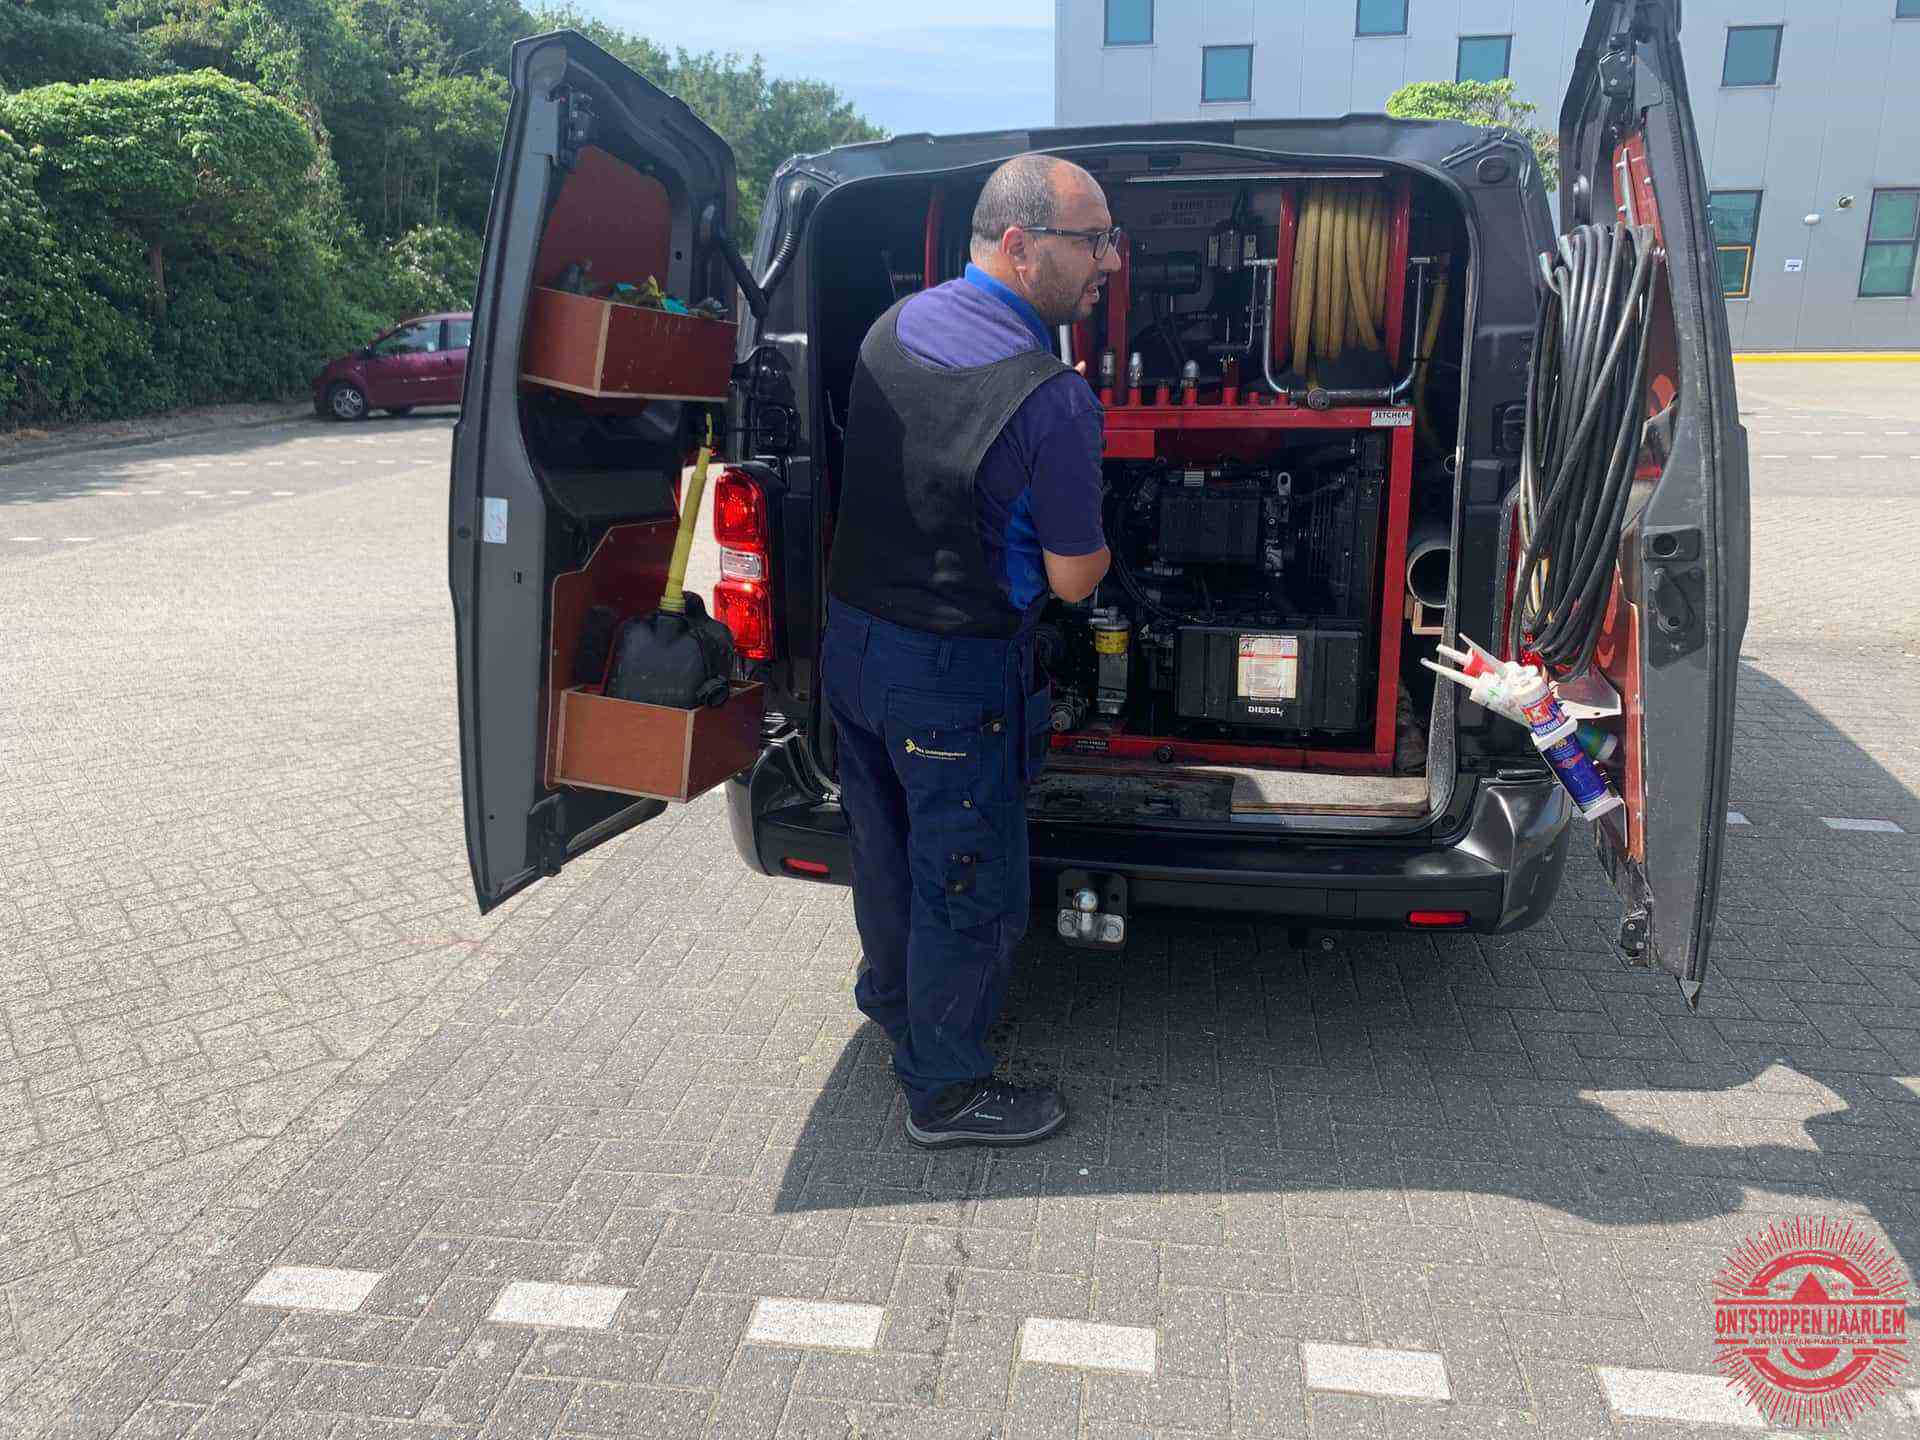 Loodgieter Haarlem Ontstopping